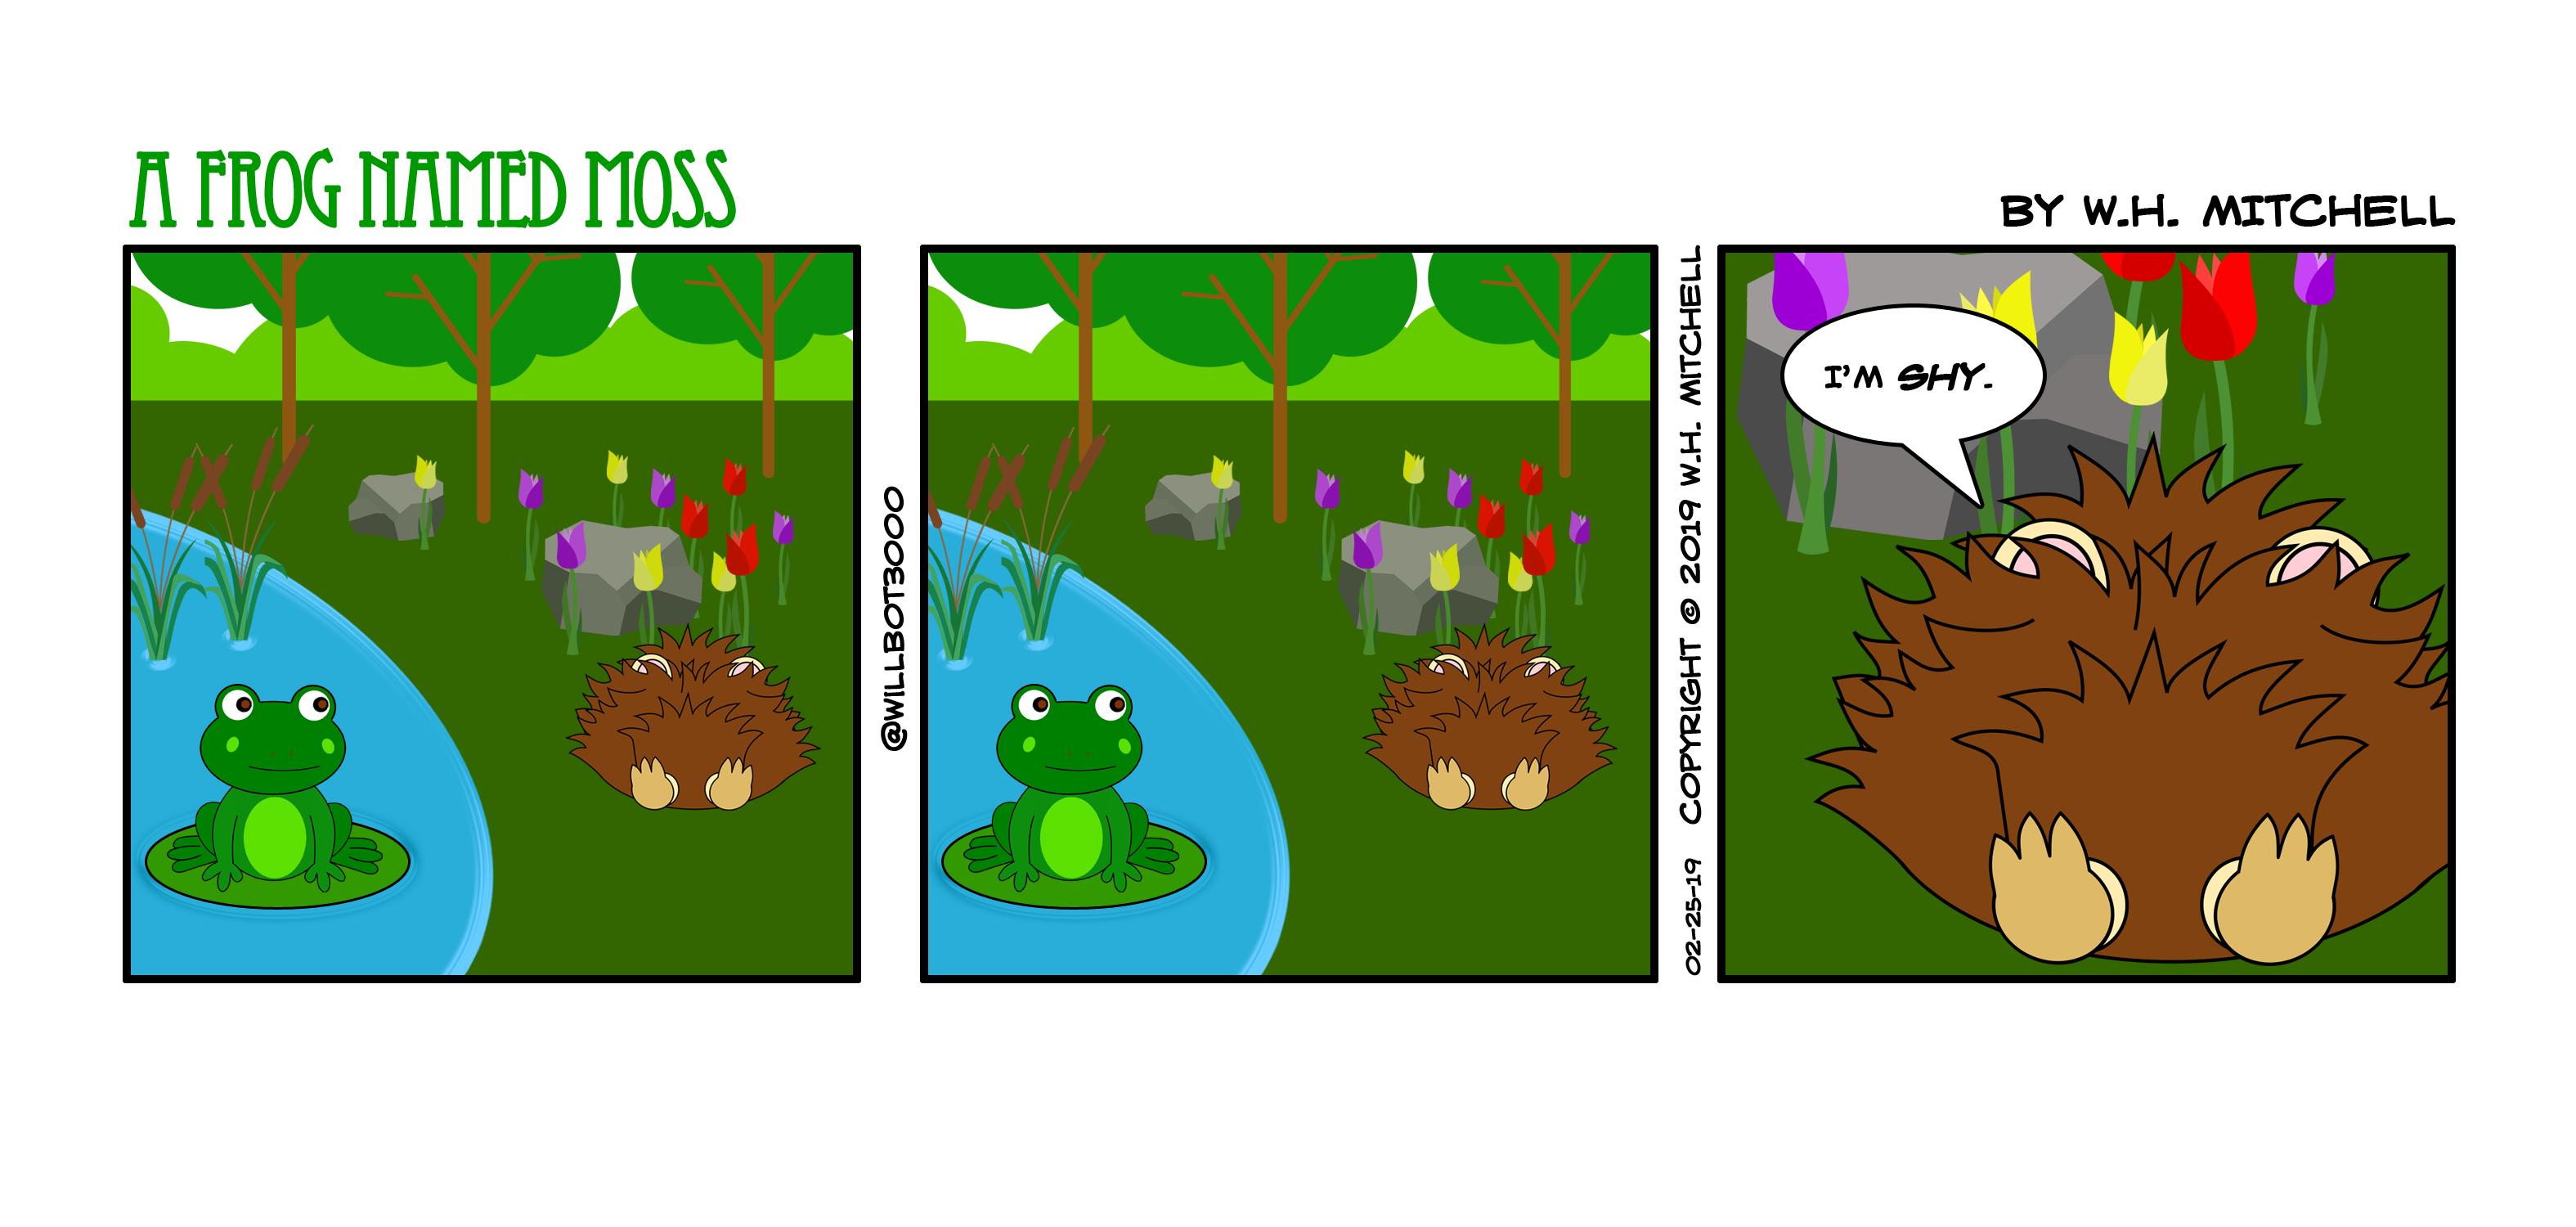 Shy as a Hedgehog (Comic - 2/25/19)